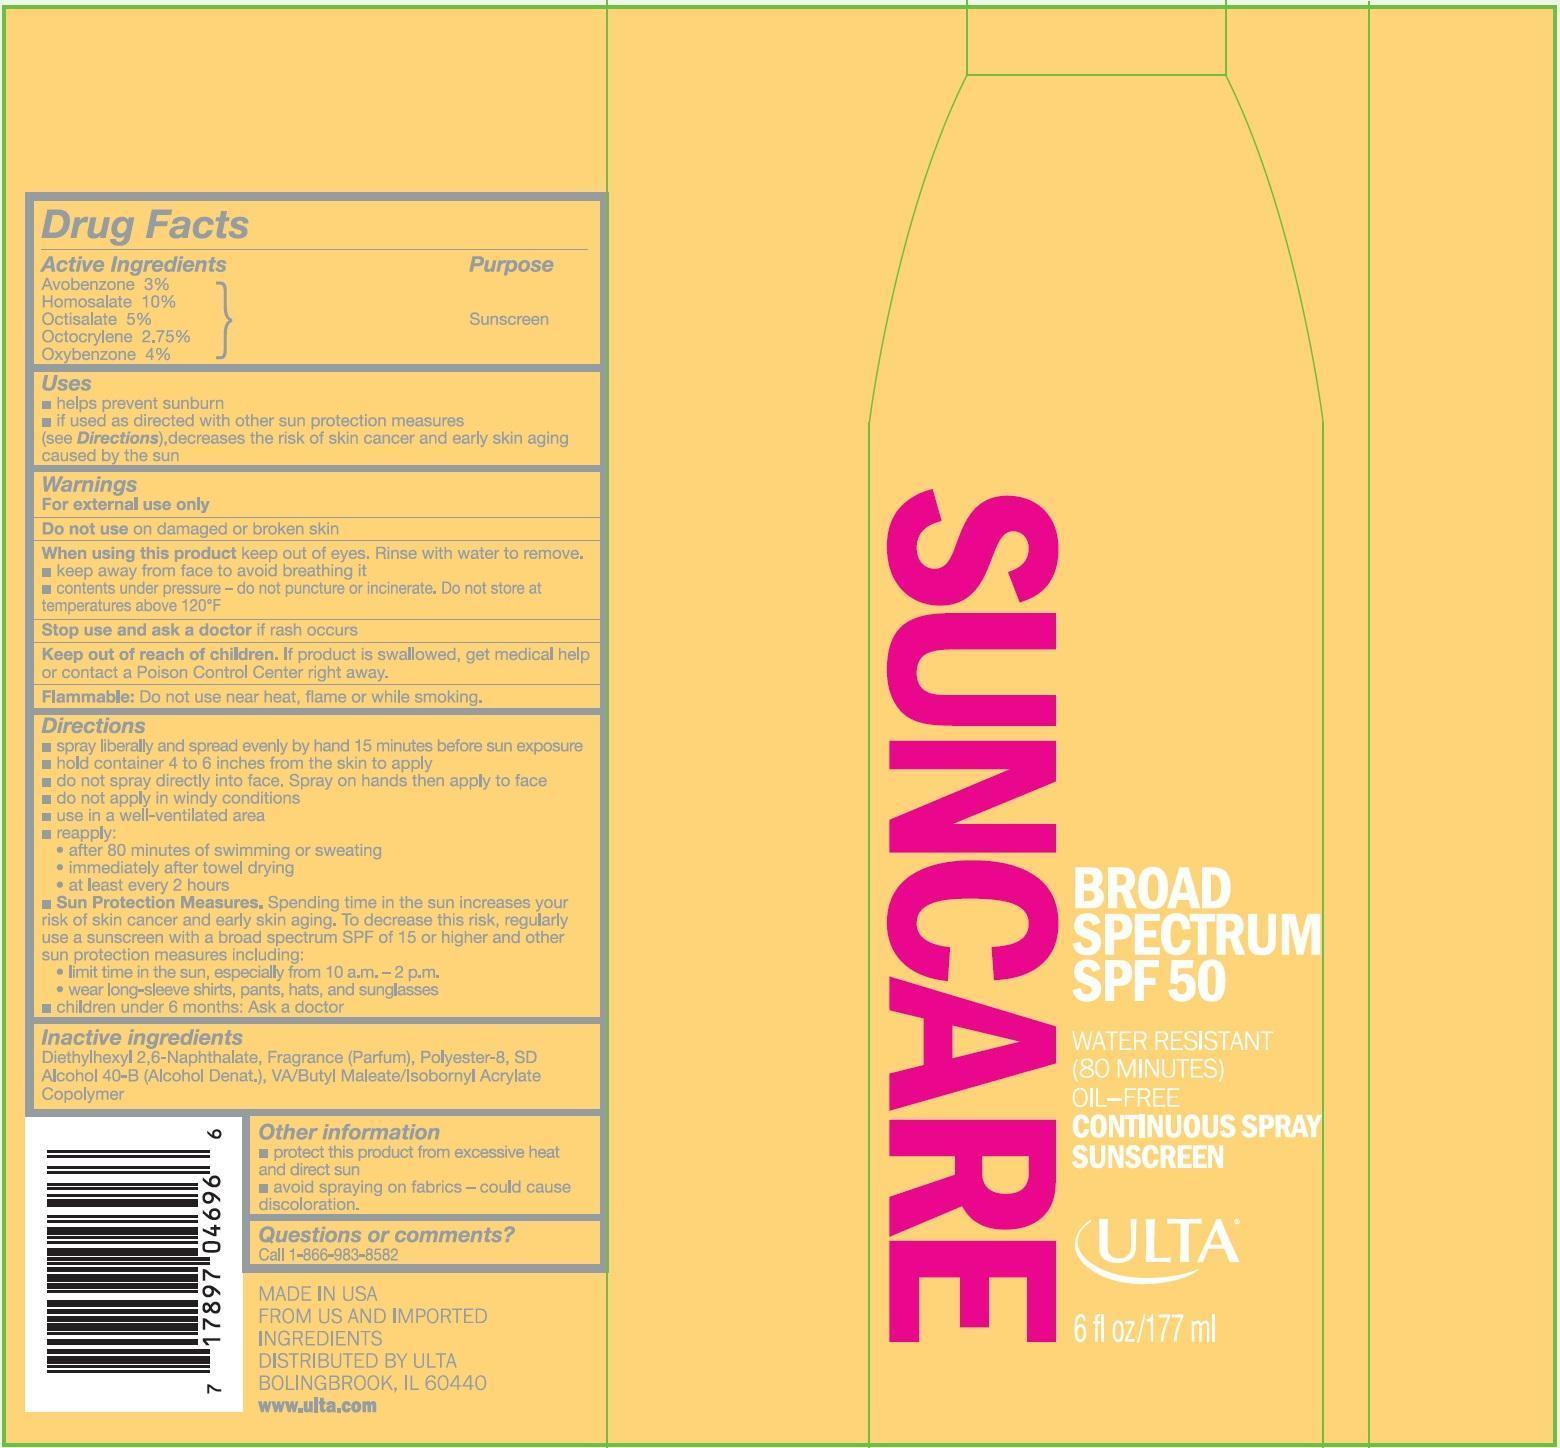 Ulta Broad Spectrum Spf 50 (Avobenzone, Homosalate, Octisalate, Octocrylene And Oxybenzone) Spray [Prime Packaging, Inc.]